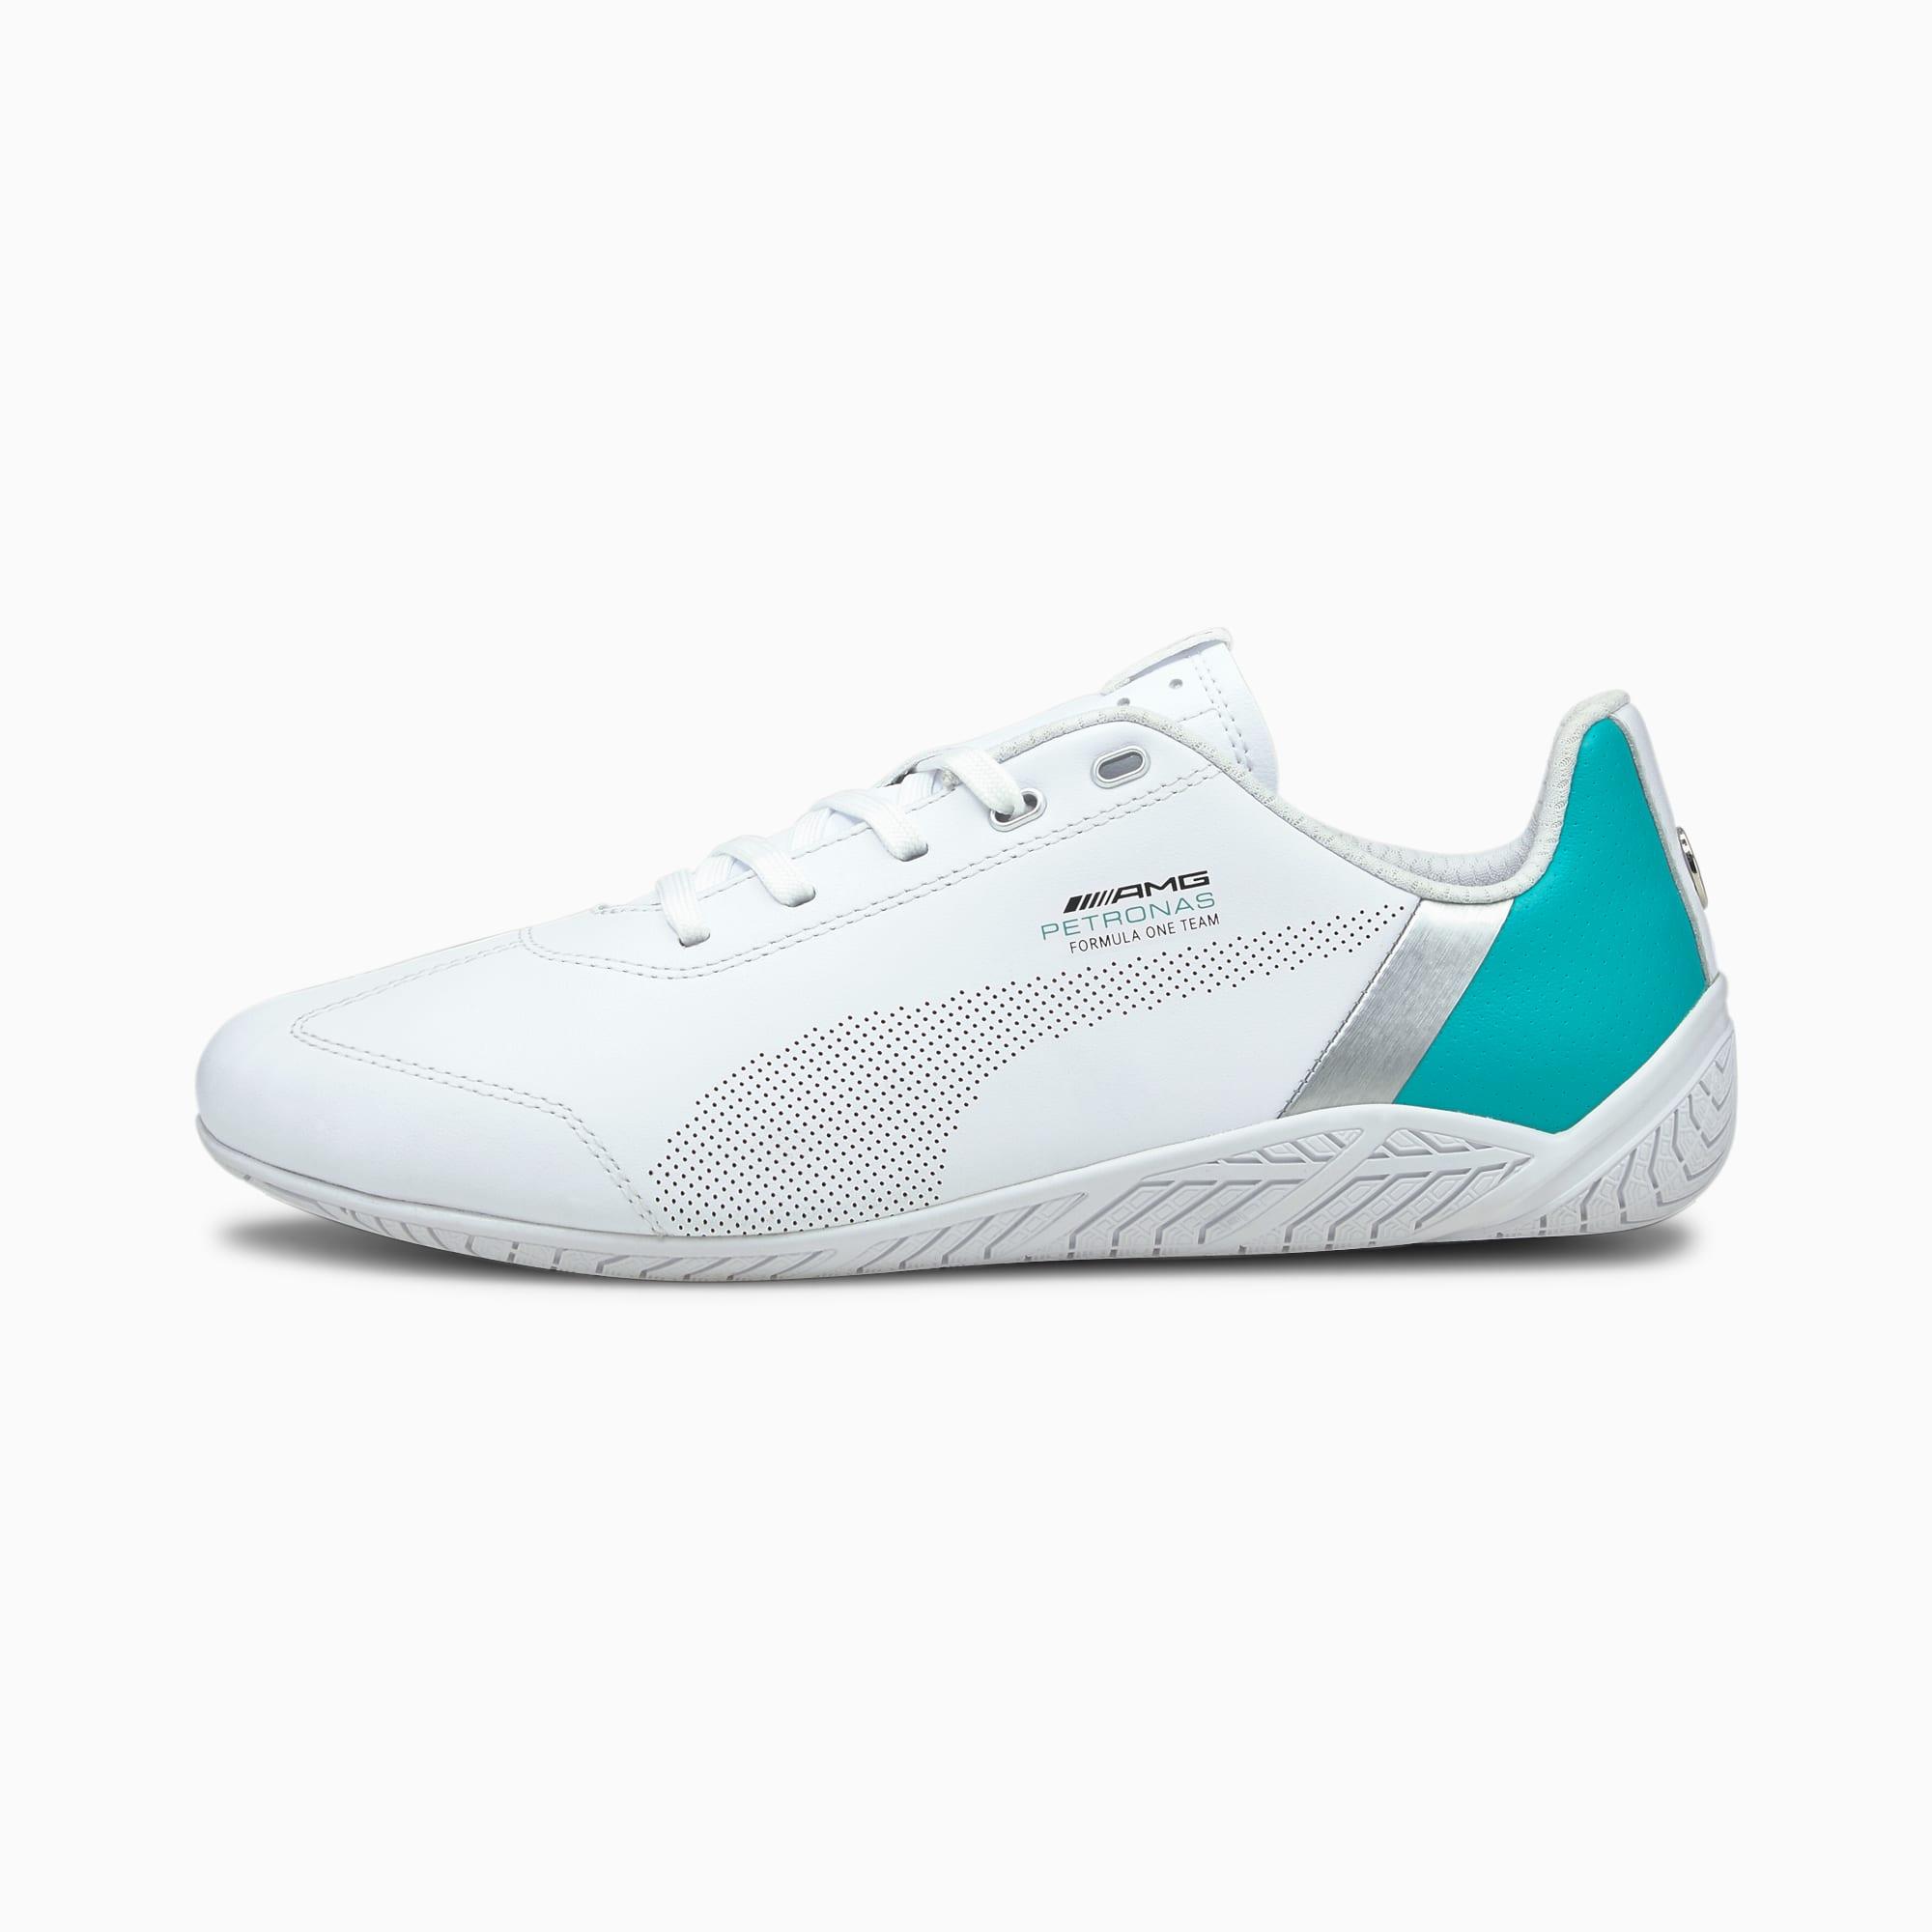 Mercedes F1 Rdg Cat Unisex Shoes | Puma White-Puma White-Spectra ...